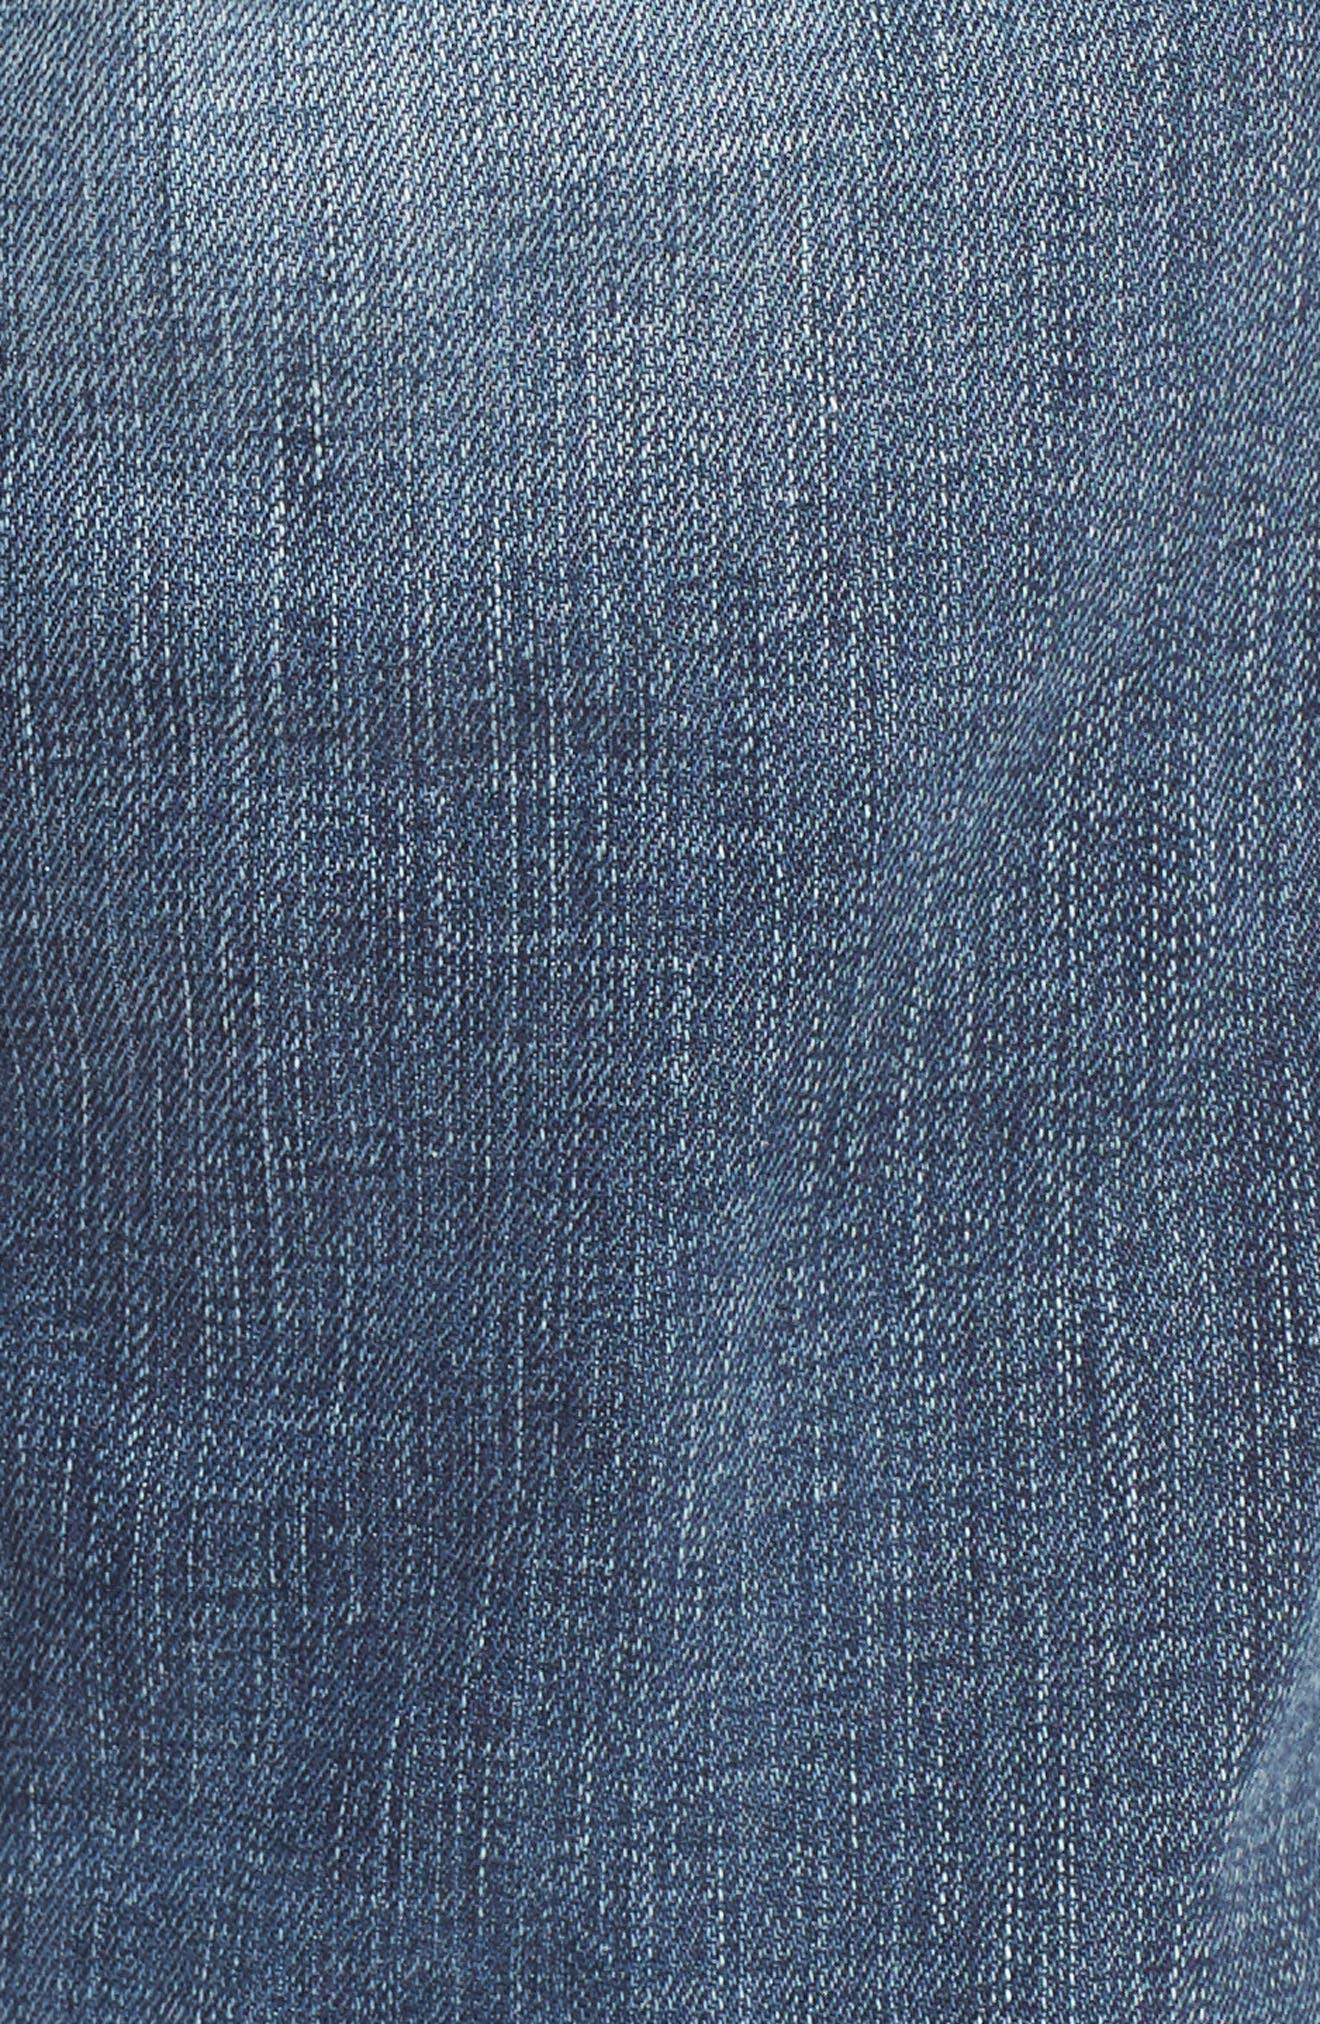 Geno Straight Leg Jeans,                             Alternate thumbnail 5, color,                             Morning Haze